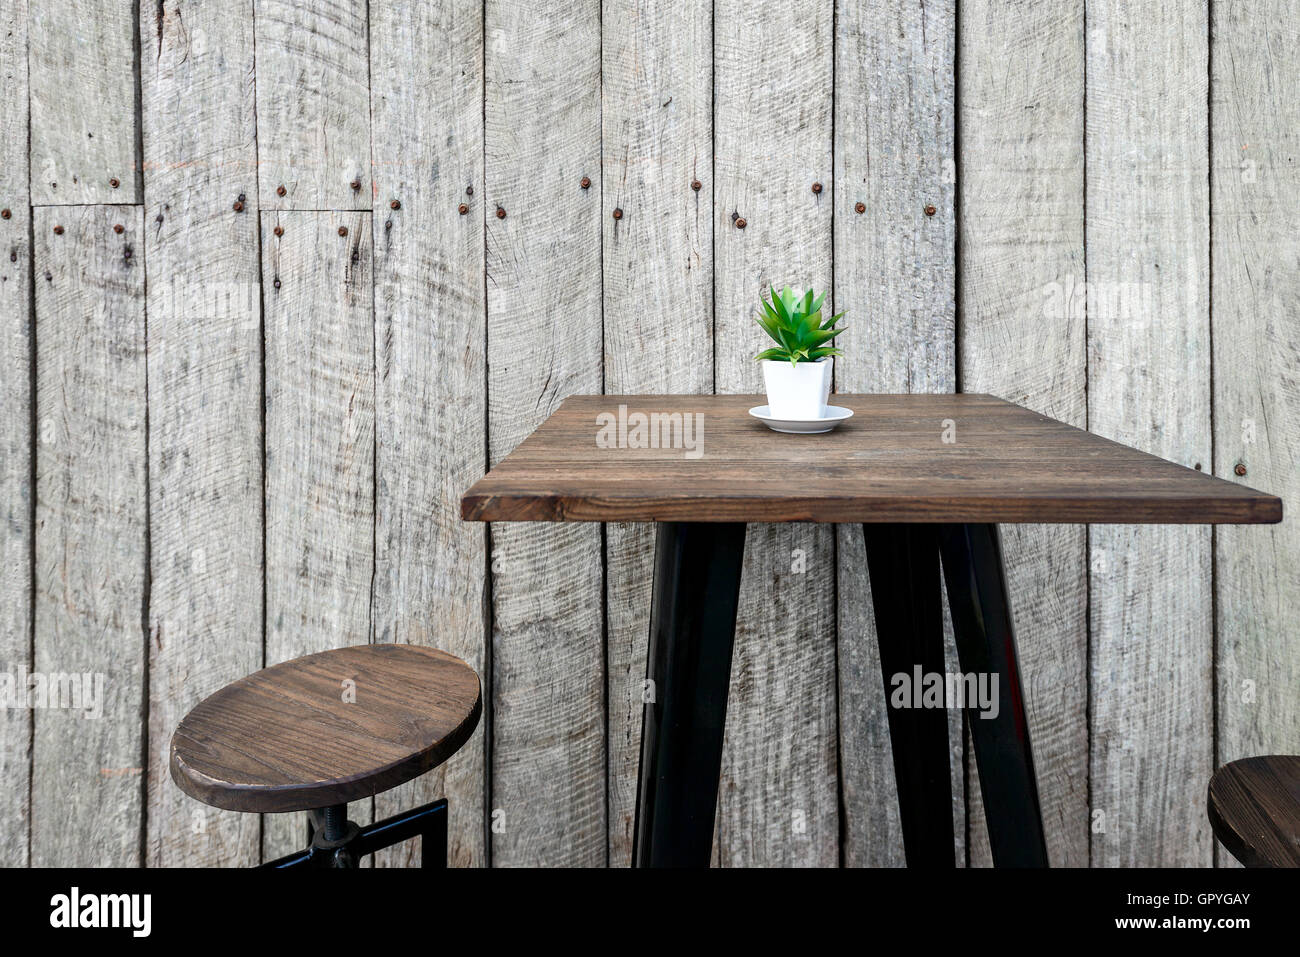 Vintage cafe in legno tavolo con un fiore verde sulla parte